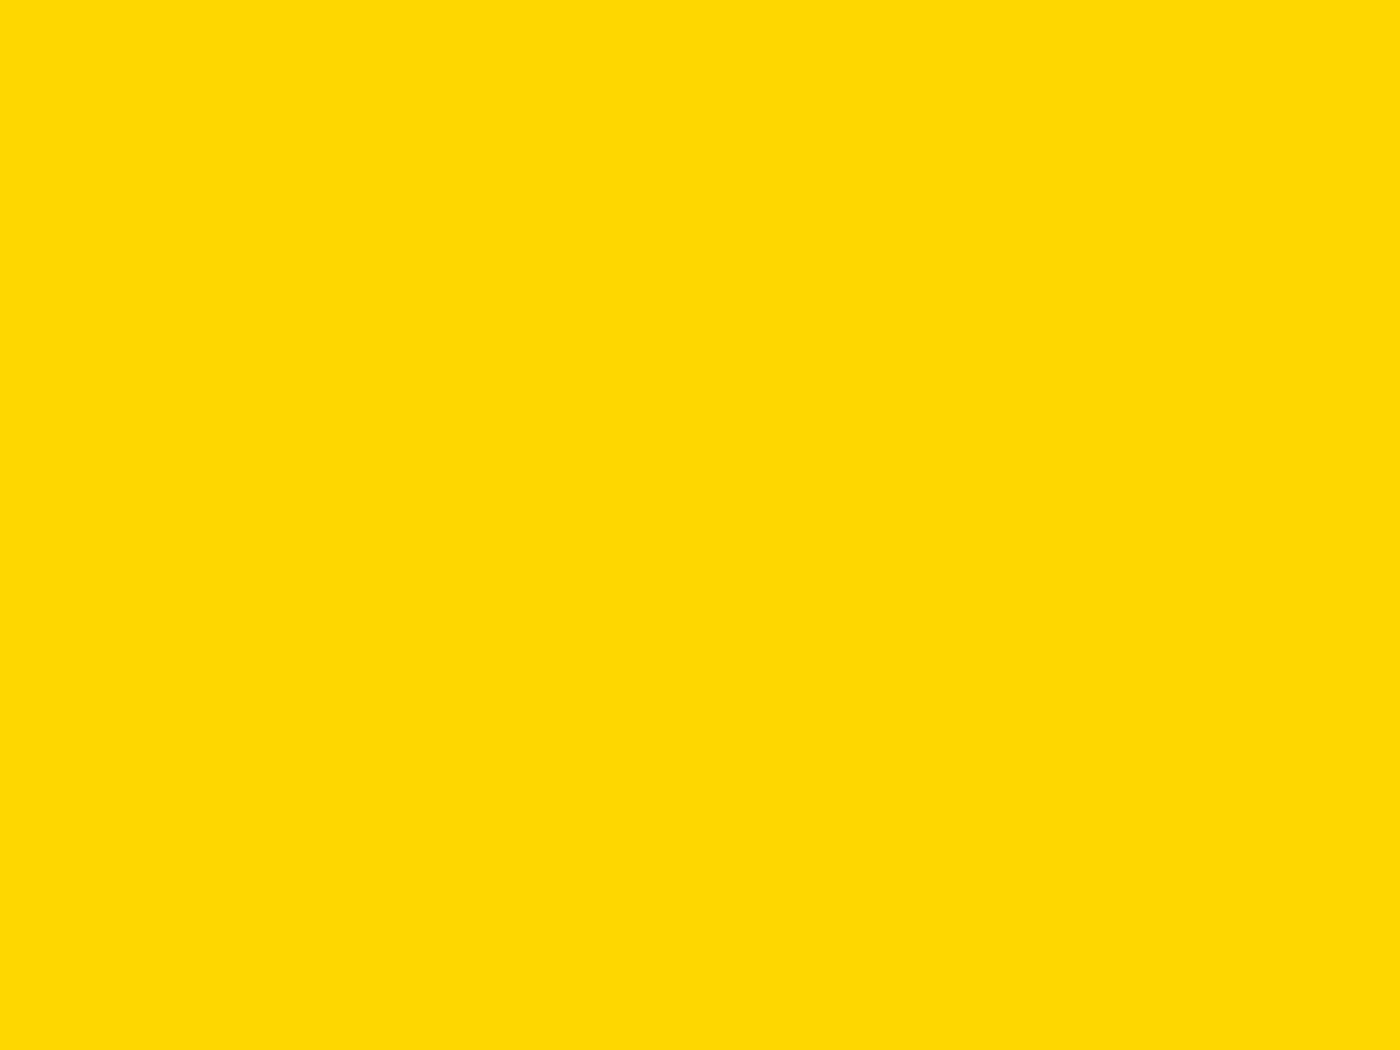 Gold Color Background - WallpaperSafari